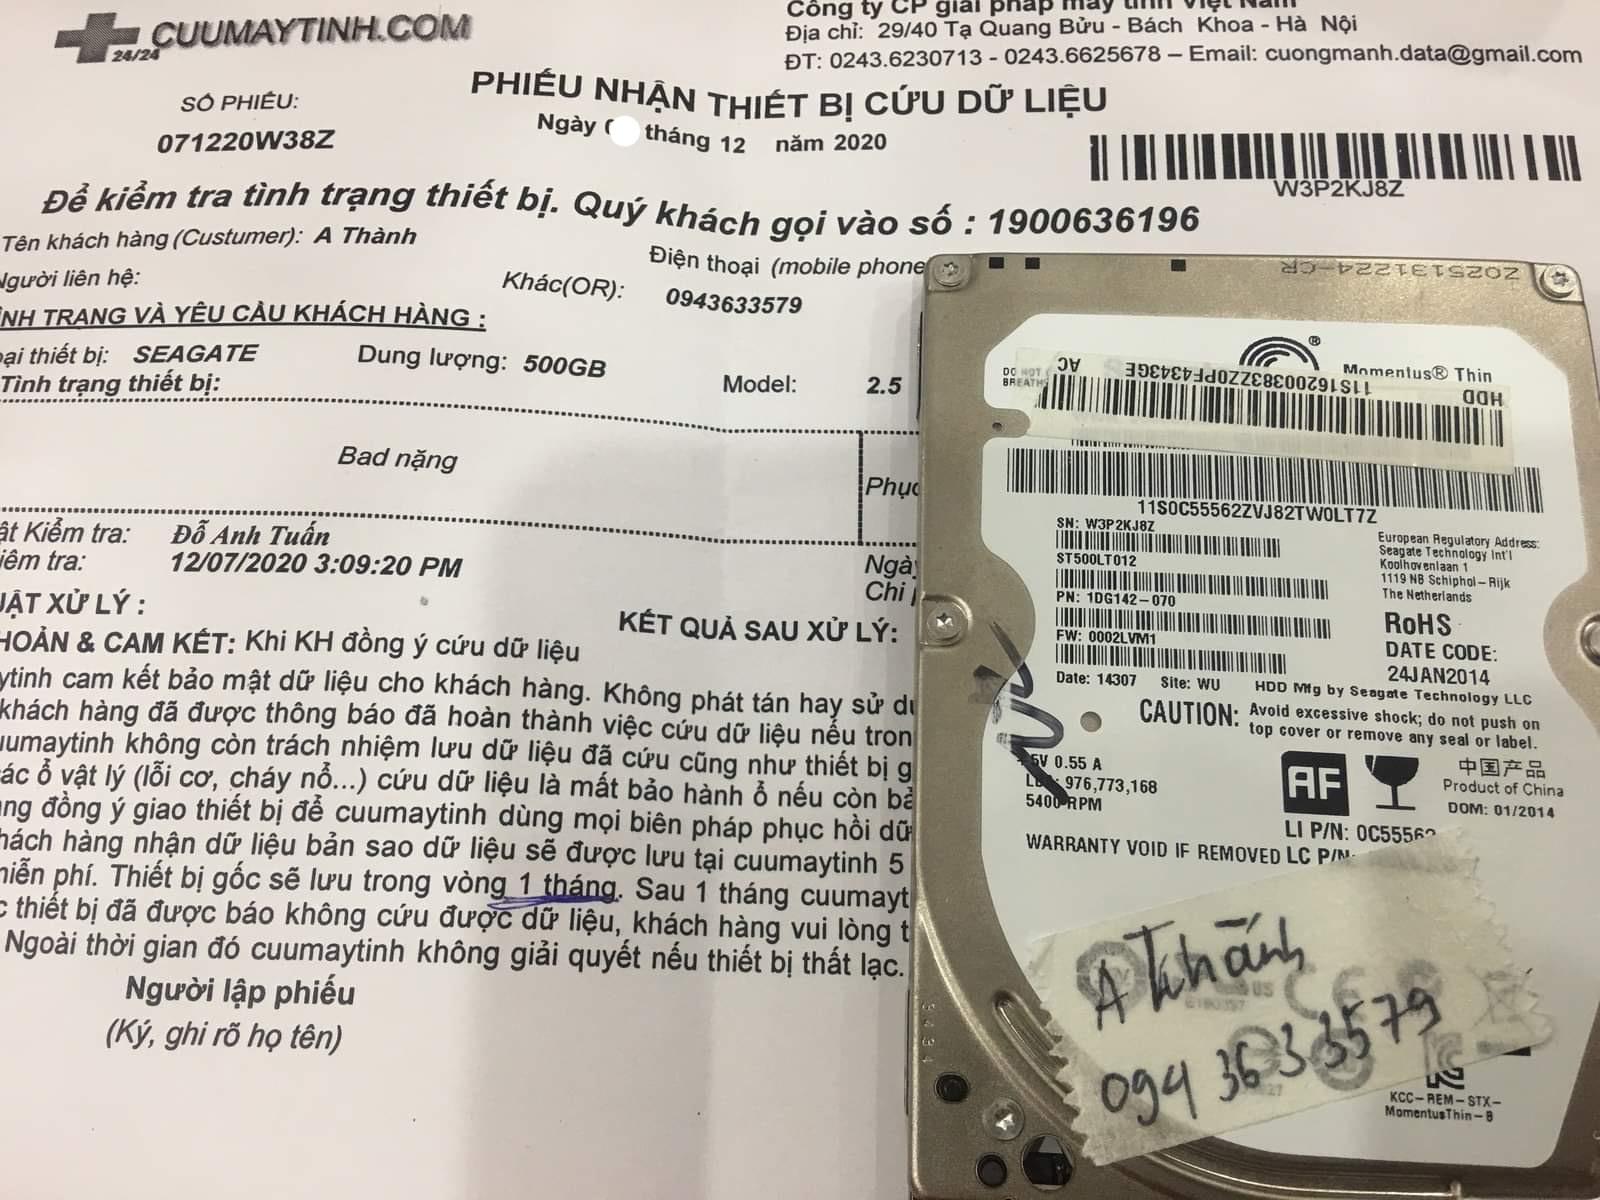 Khôi phục dữ liệu ổ cứng Seagate 1TB bad - 14/12/2020 - cuumaytinh